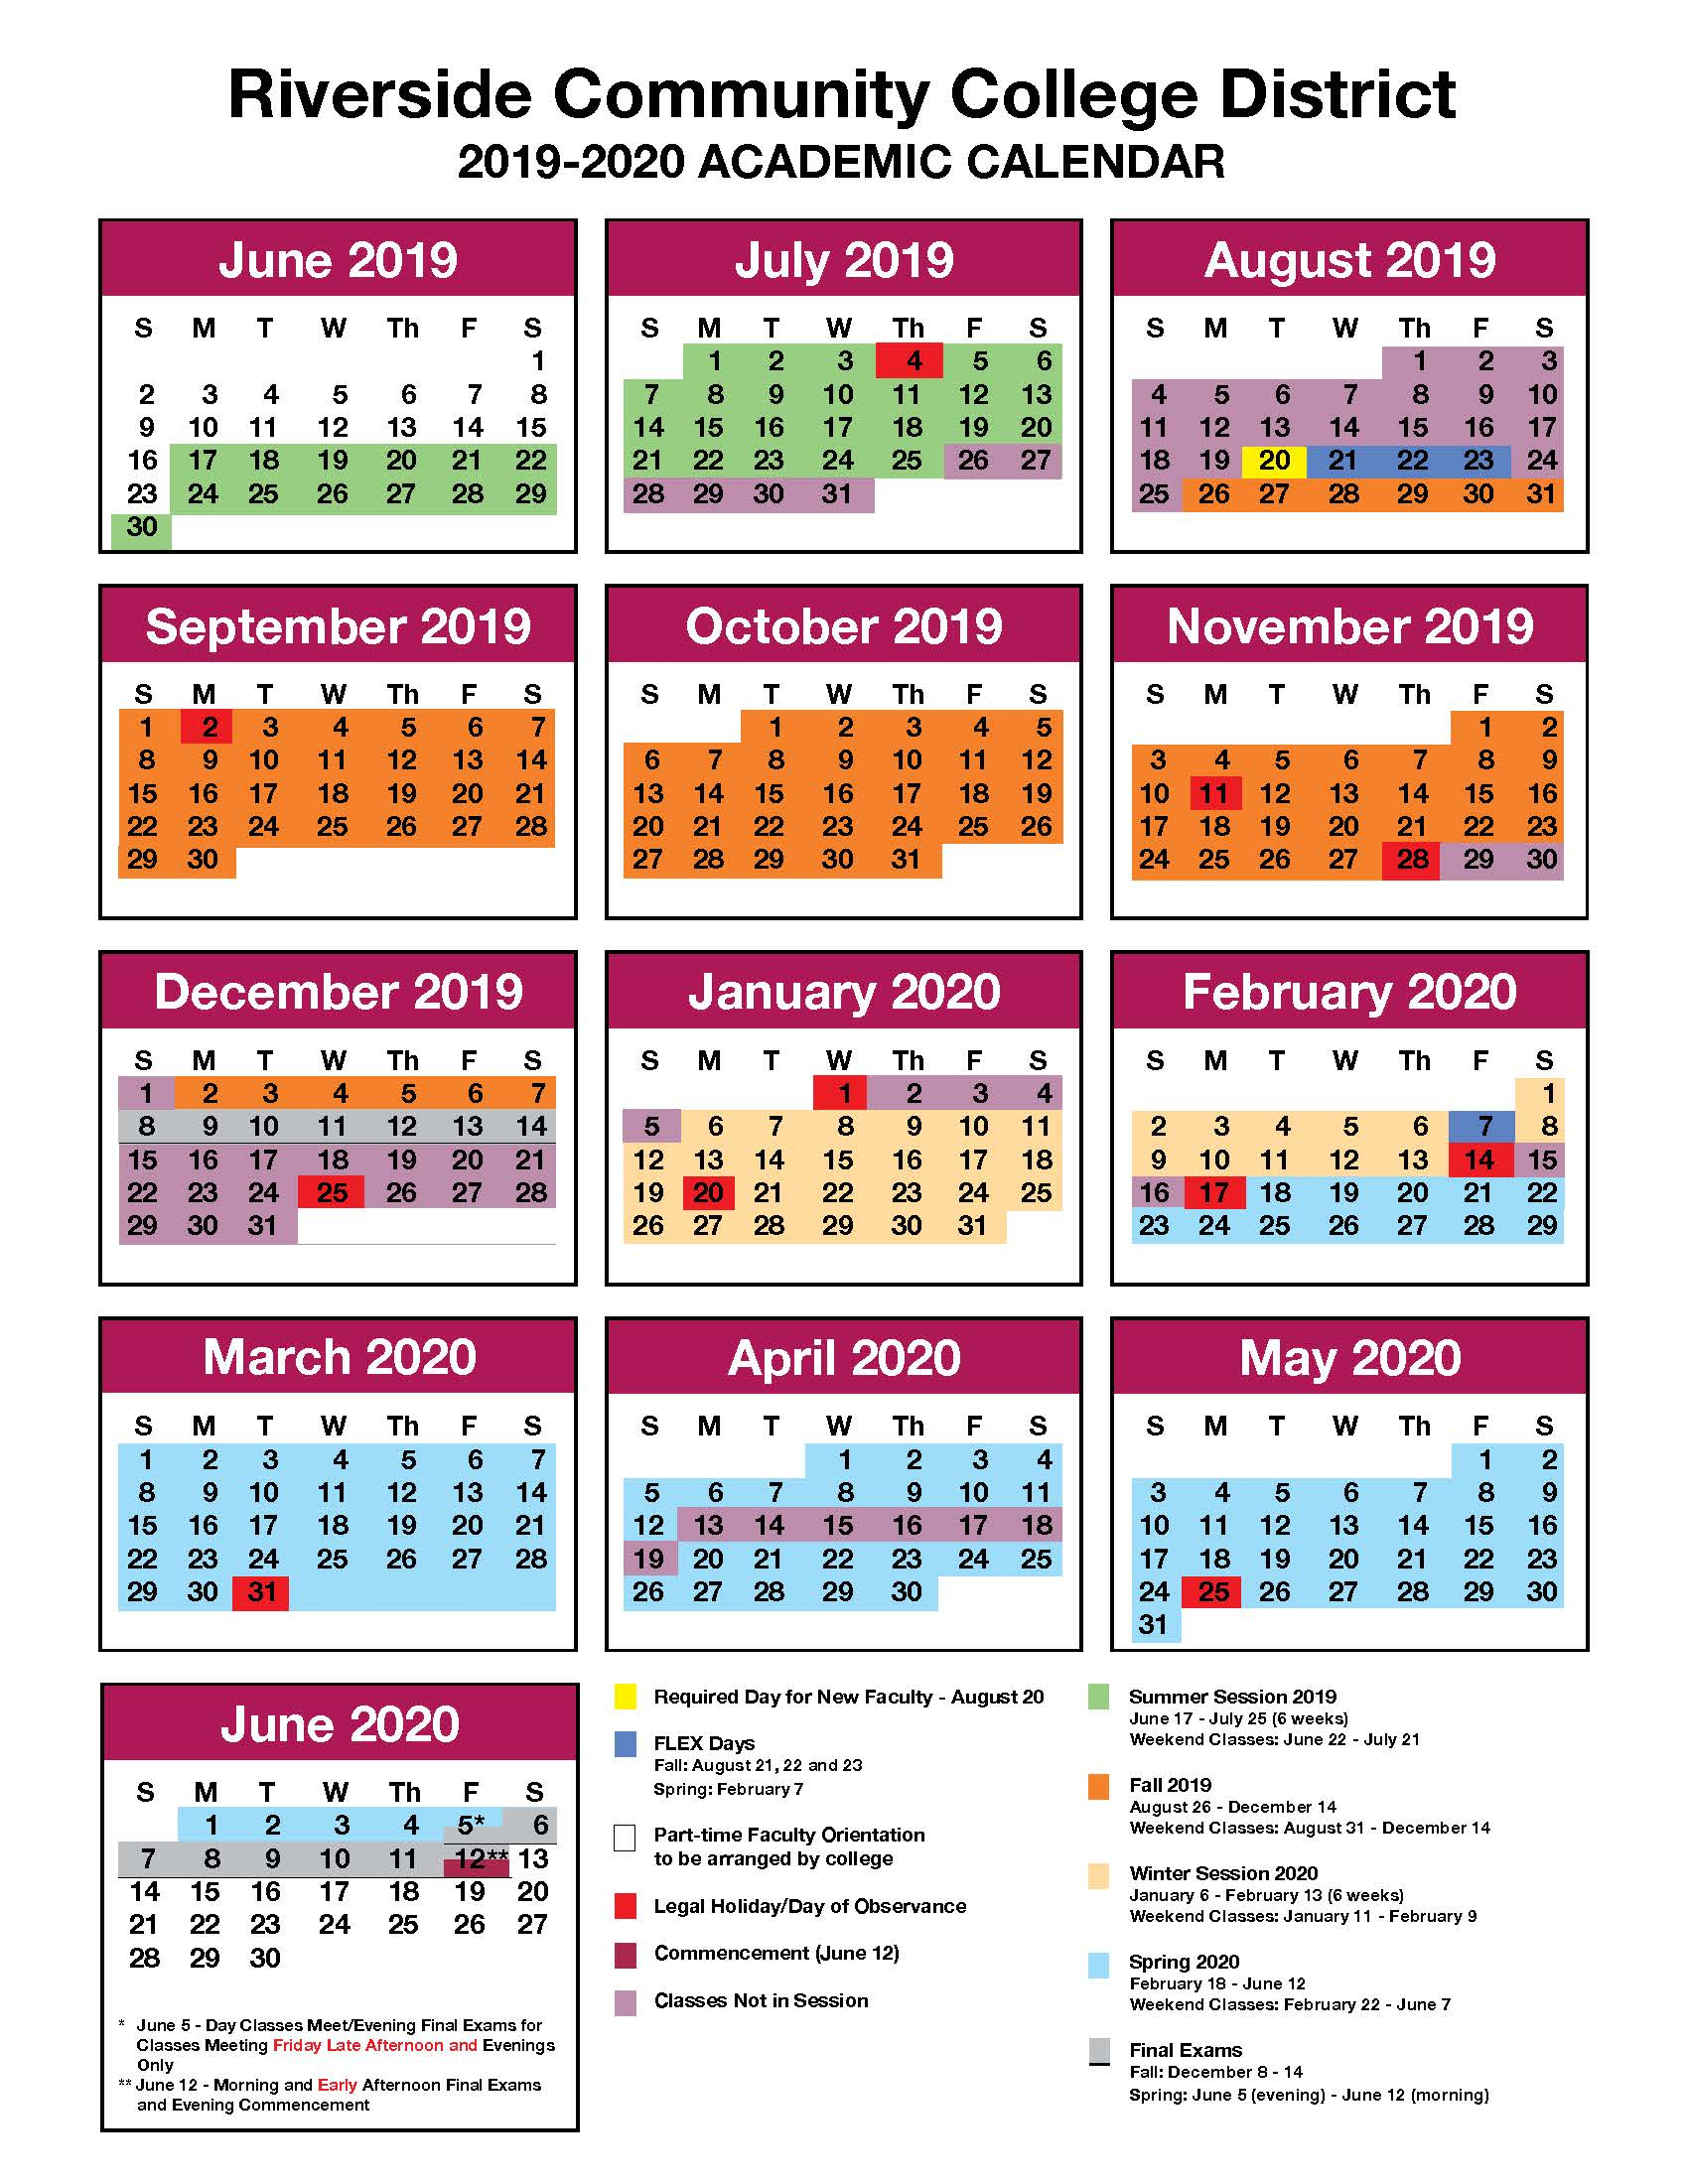 Jfk And Norco College Calendar 2019 2020 - John F. Kennedy Inside Sunny Hills High School Calendar 2021